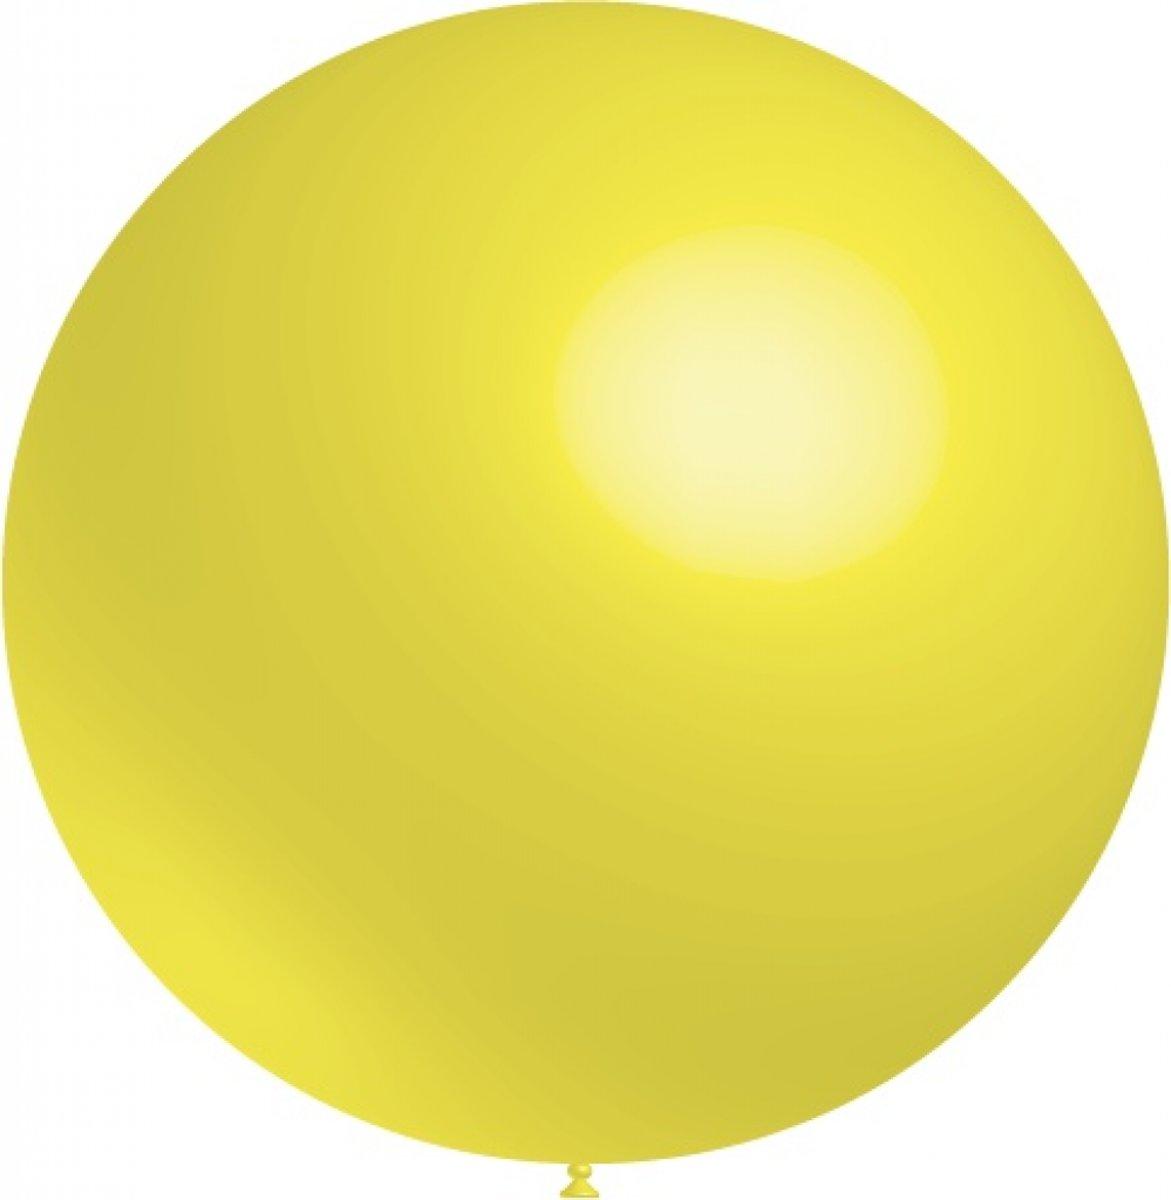 Lichtgele Reuze Ballon XL 91cm